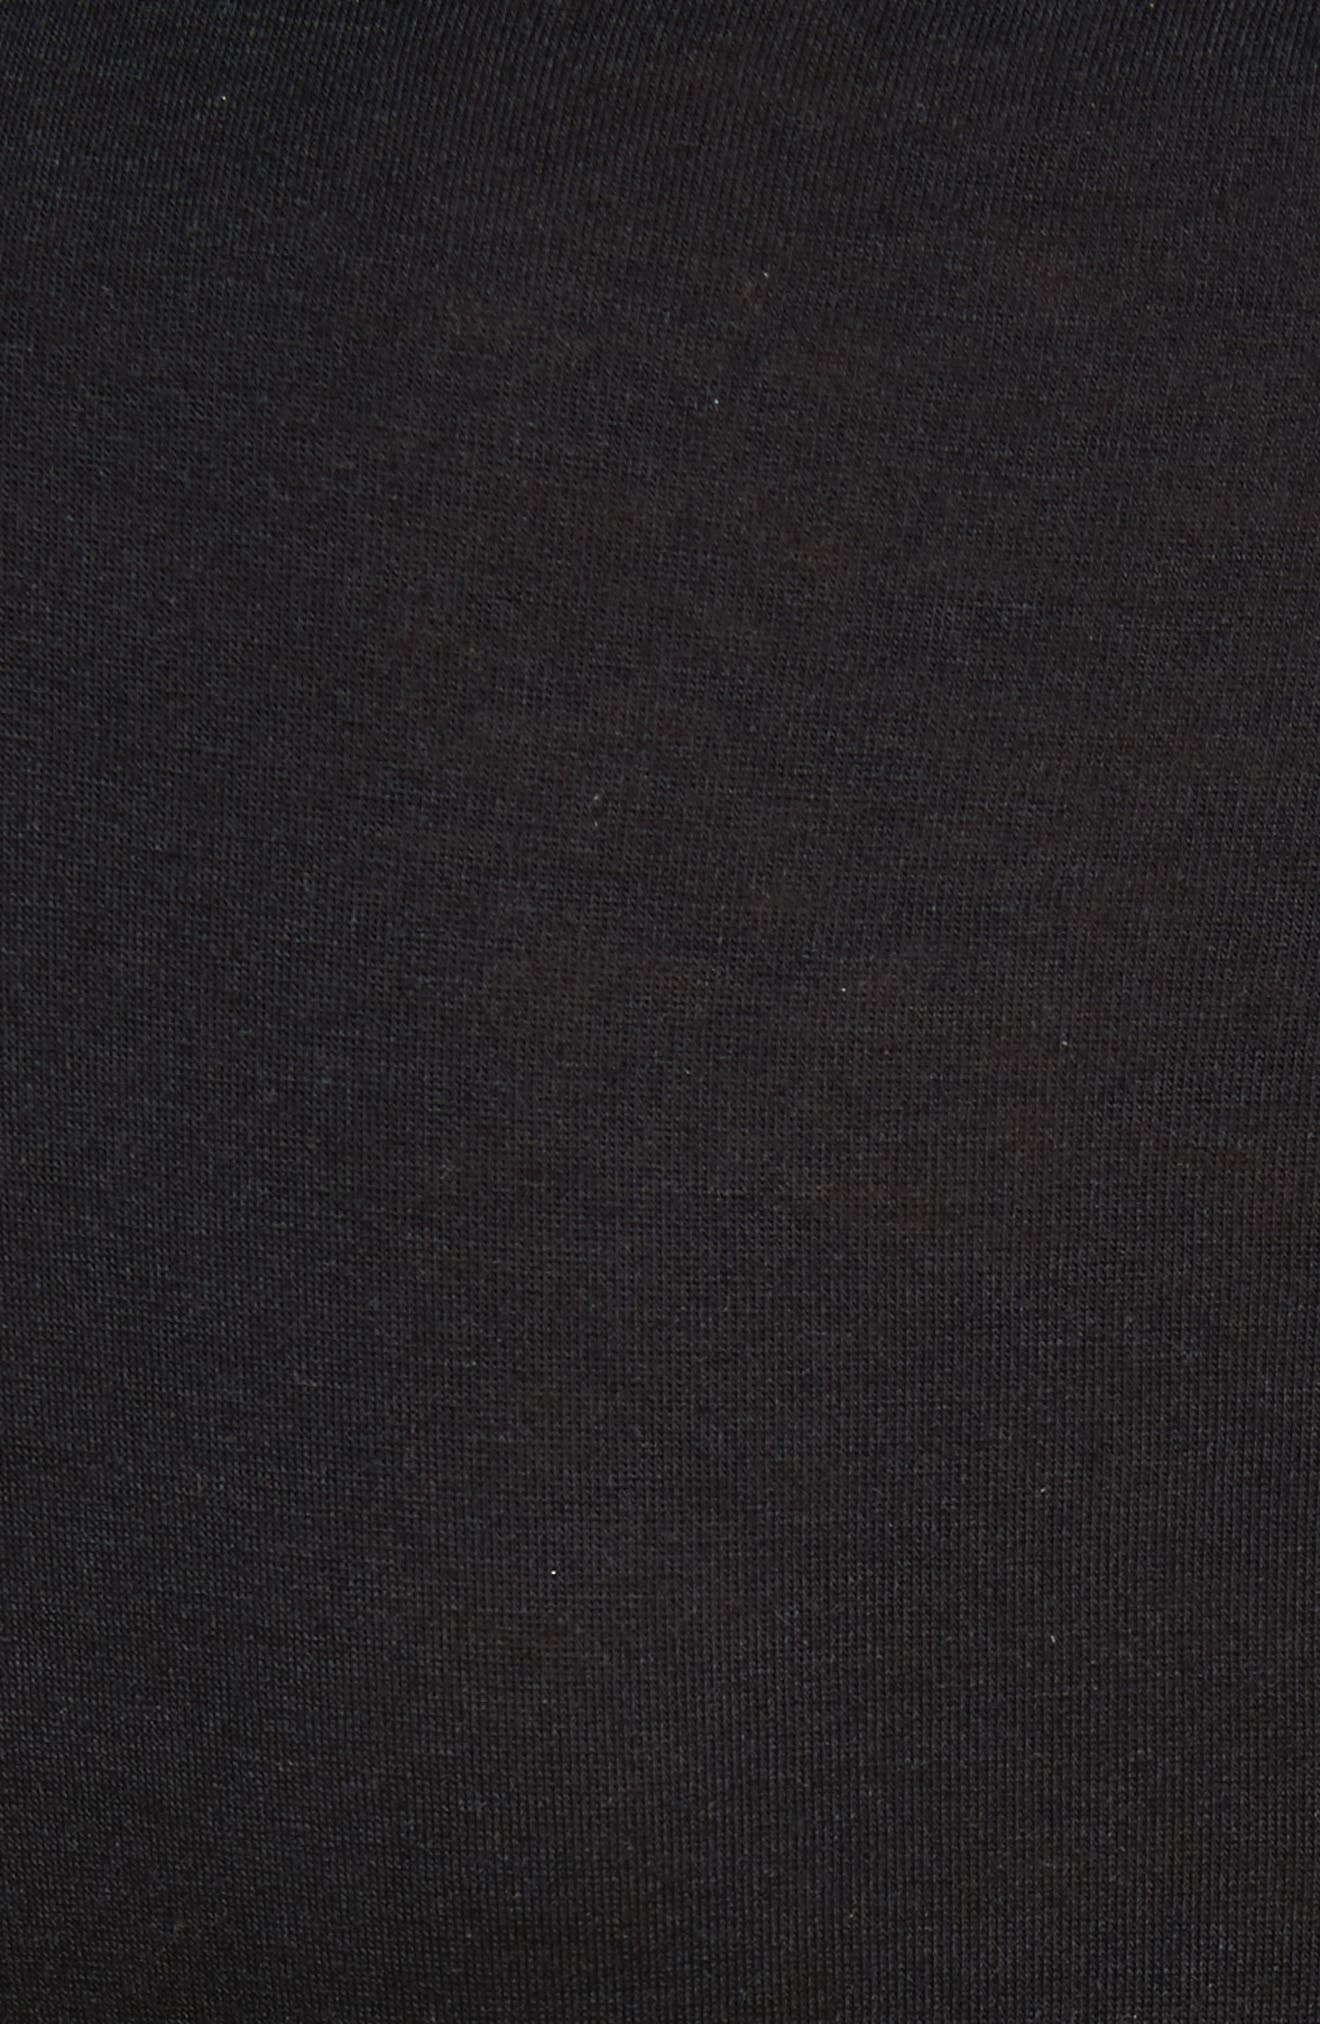 The Perfect Tee Turtleneck,                             Alternate thumbnail 5, color,                             Black